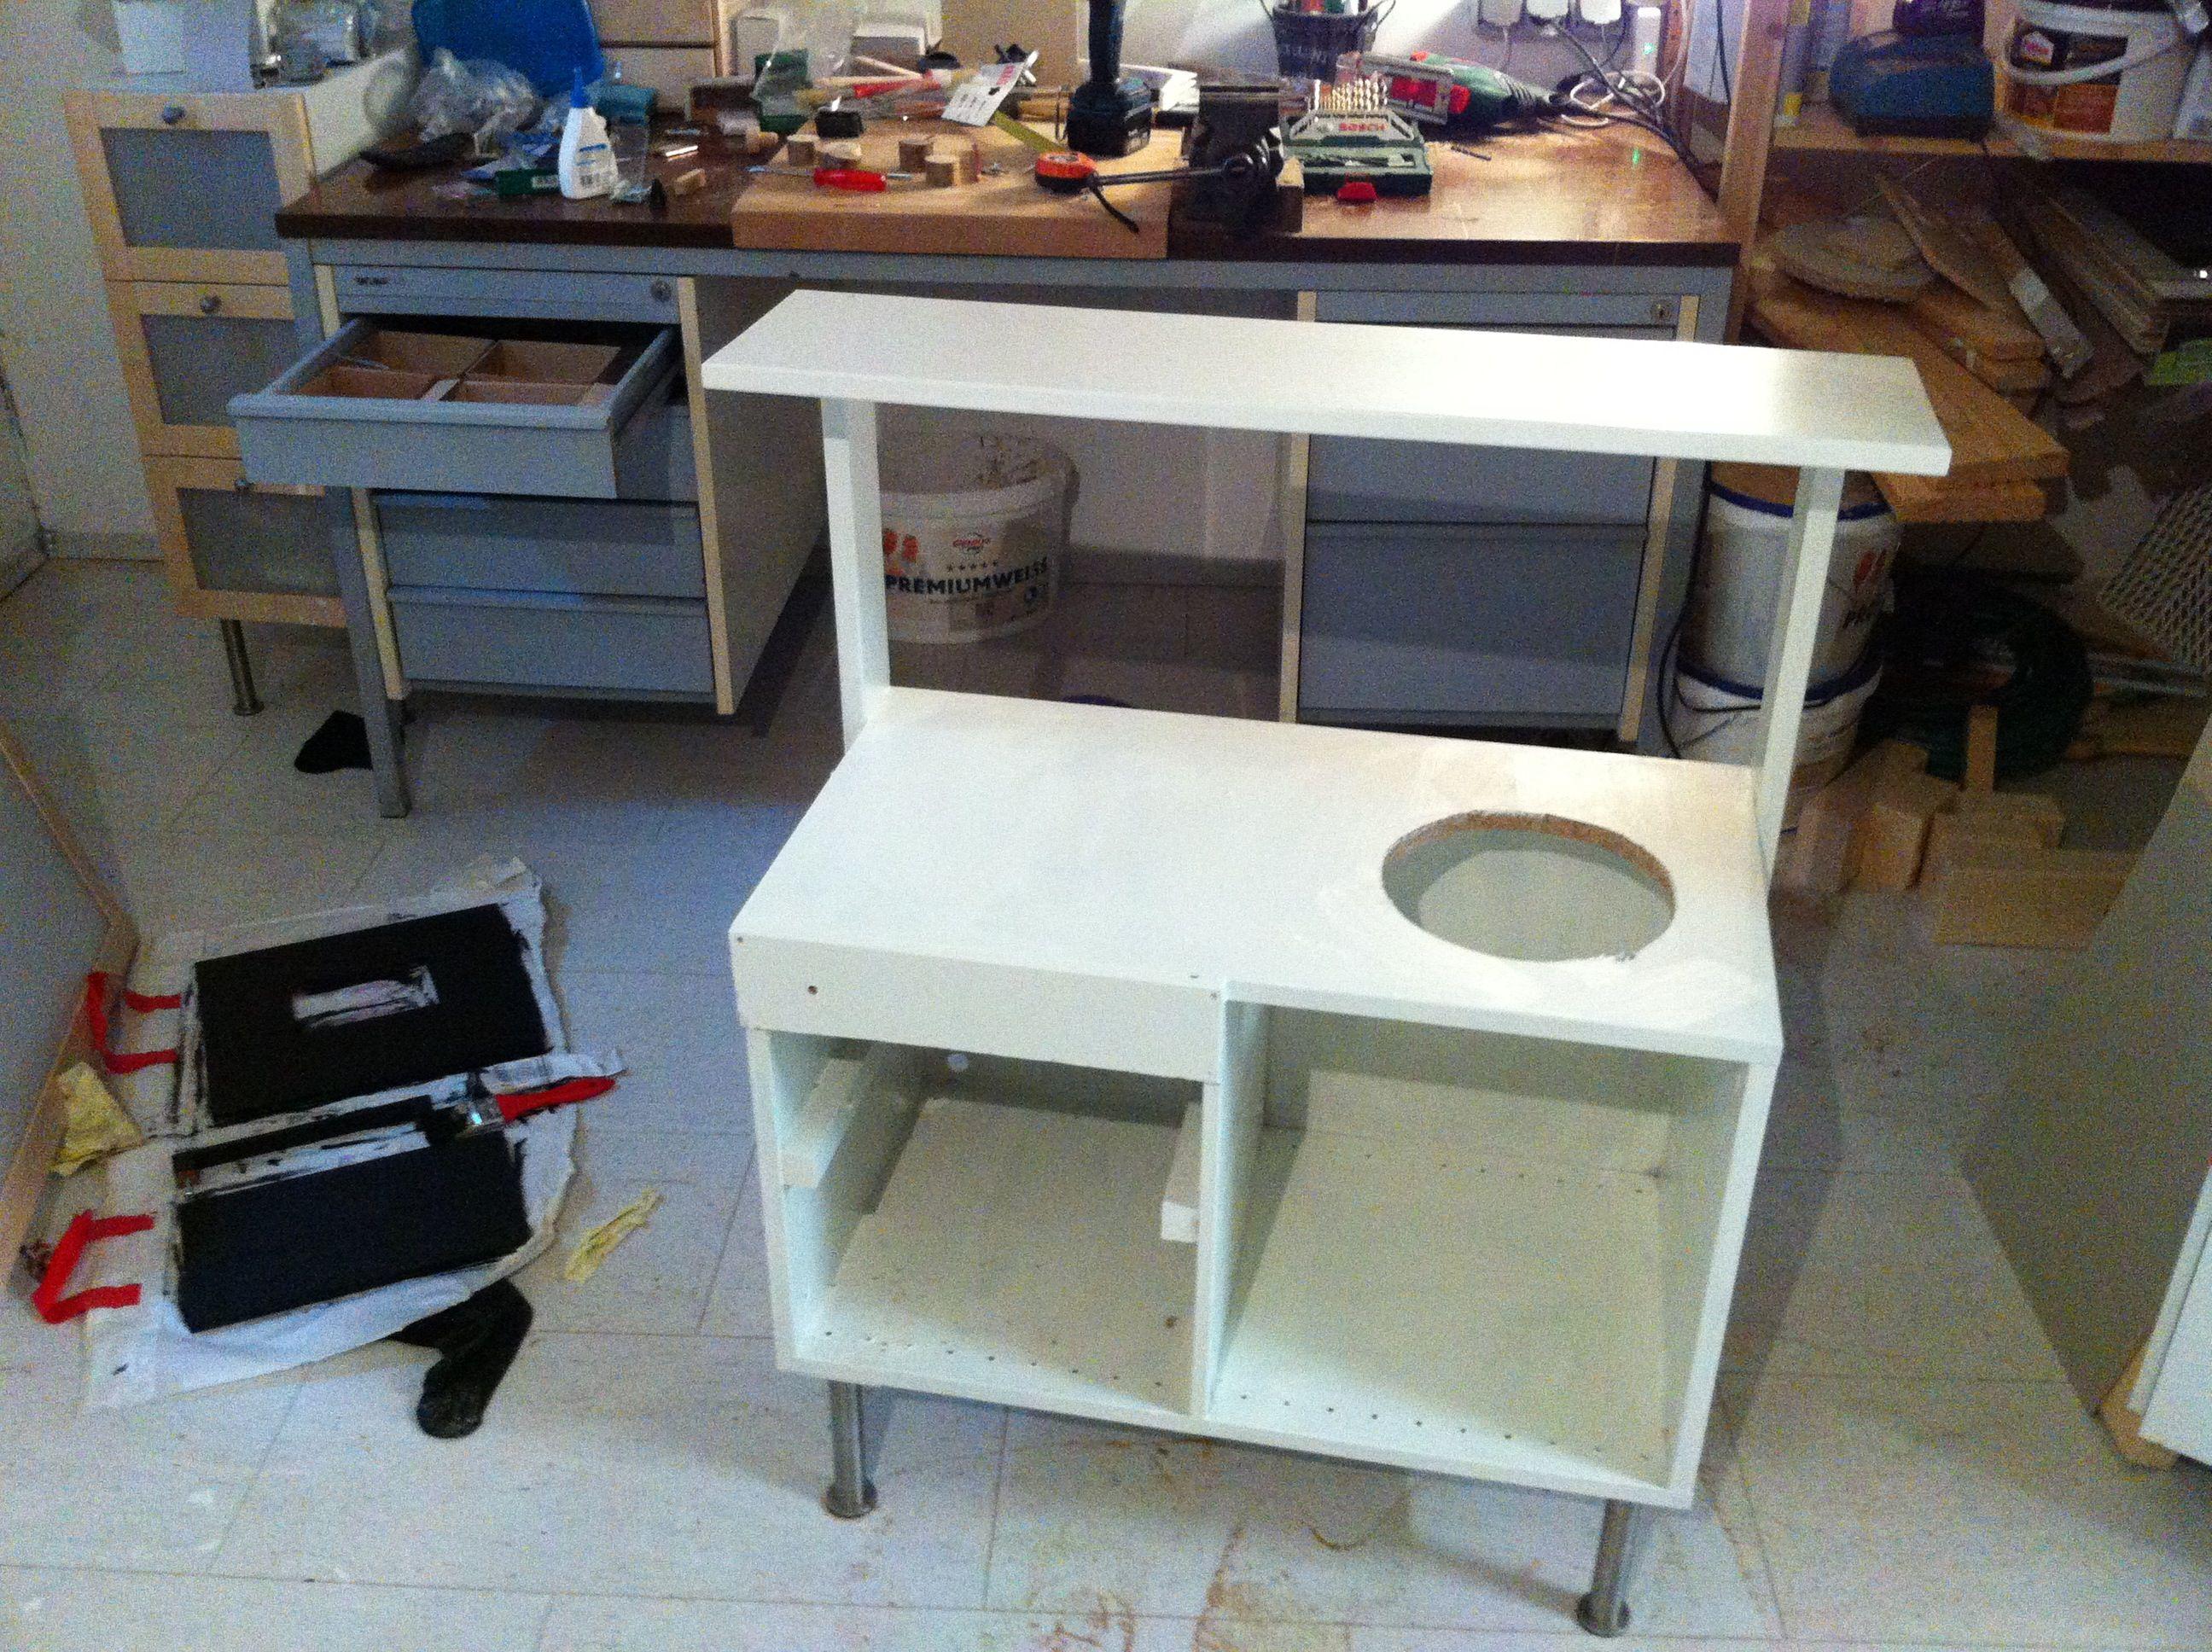 kinderk che selber bauen hausgestaltung ideen. Black Bedroom Furniture Sets. Home Design Ideas